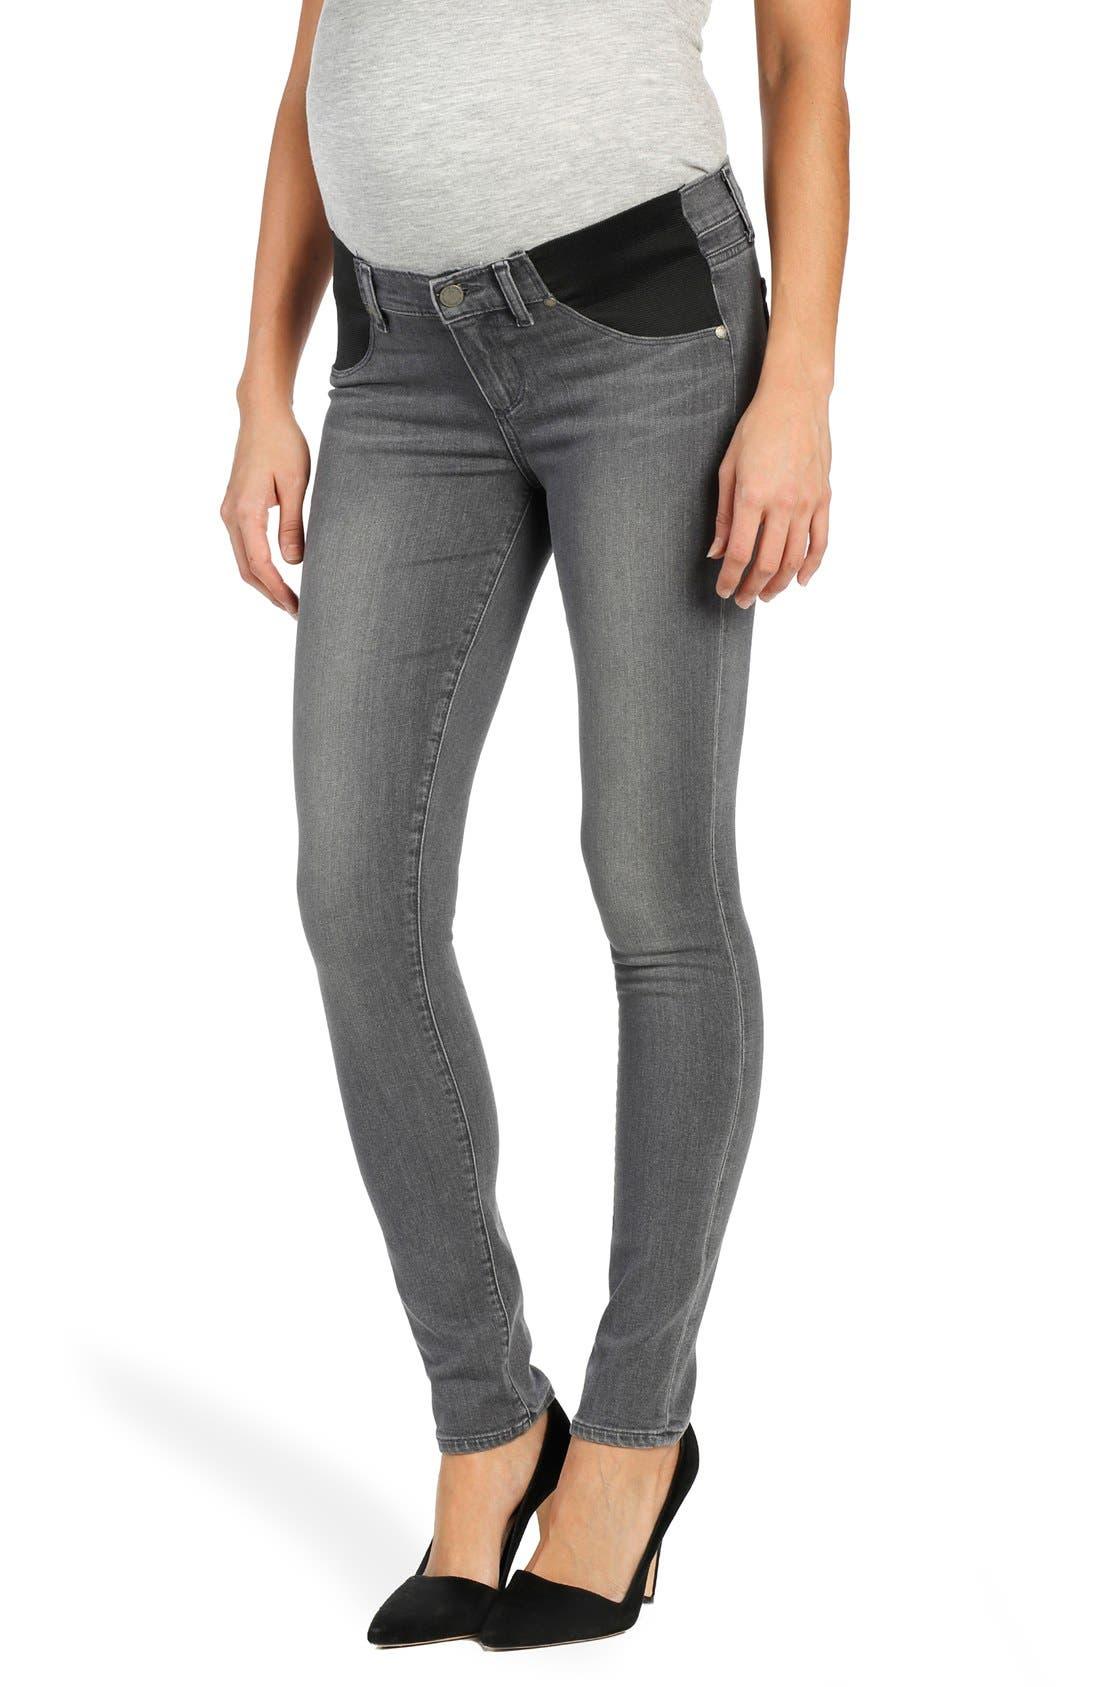 PAIGE Transcend - Verdugo Ultra Skinny Maternity Jeans (Silvie)